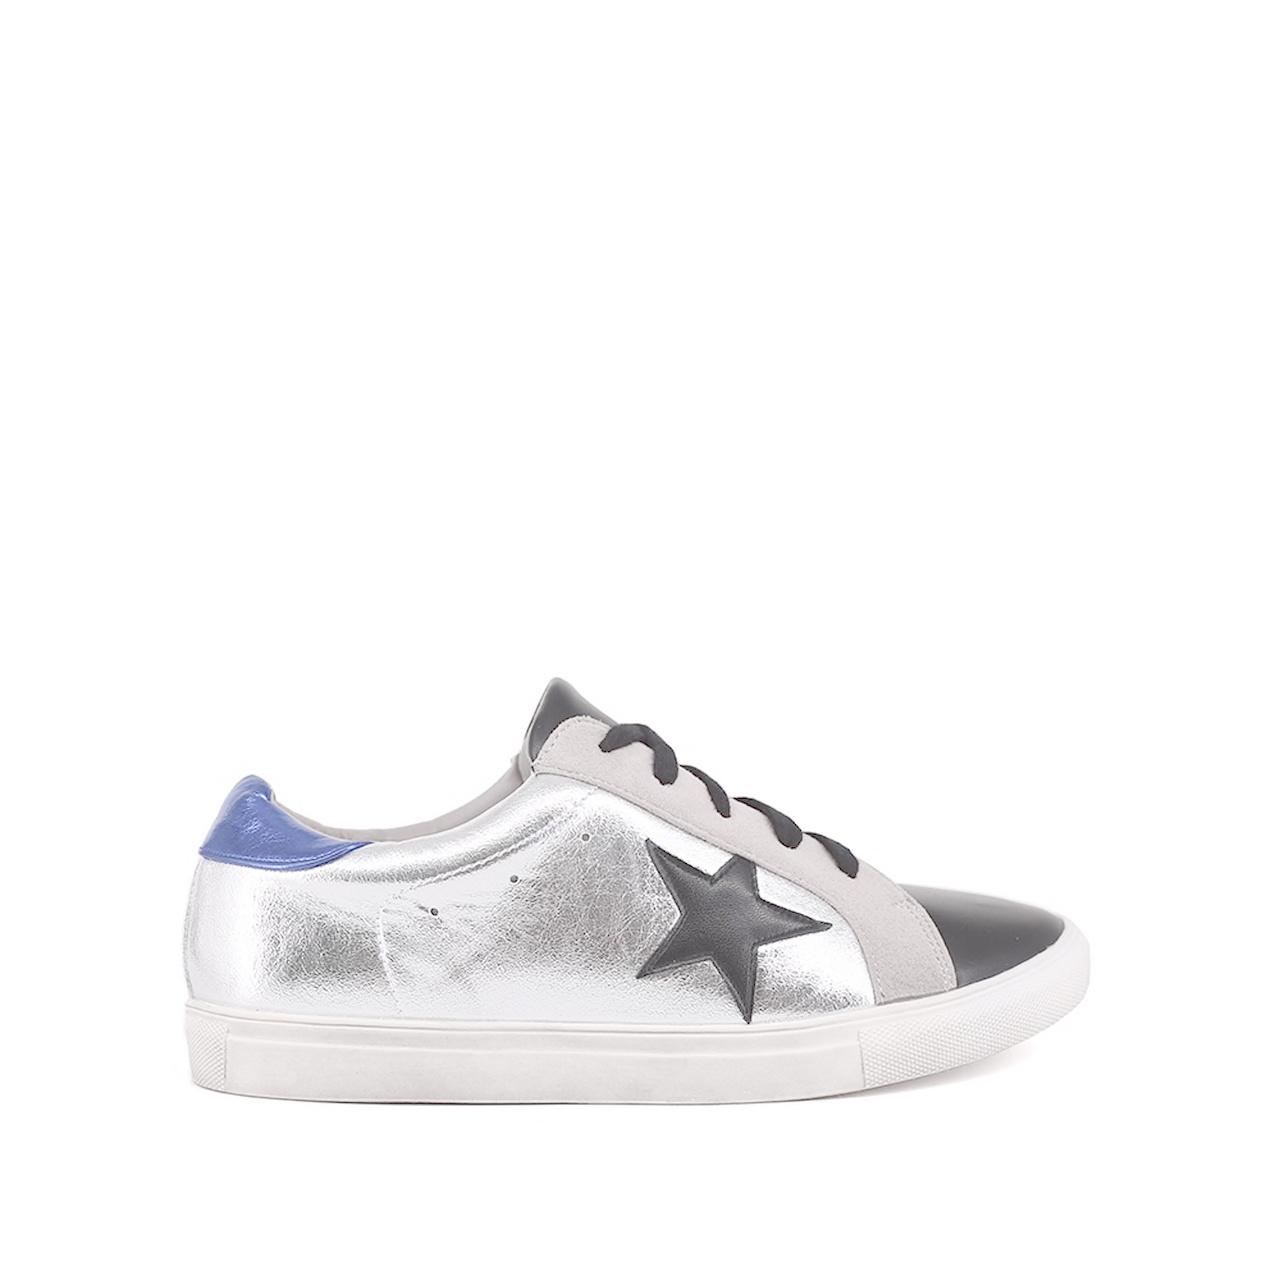 Shu Shop Superstar Sneakers